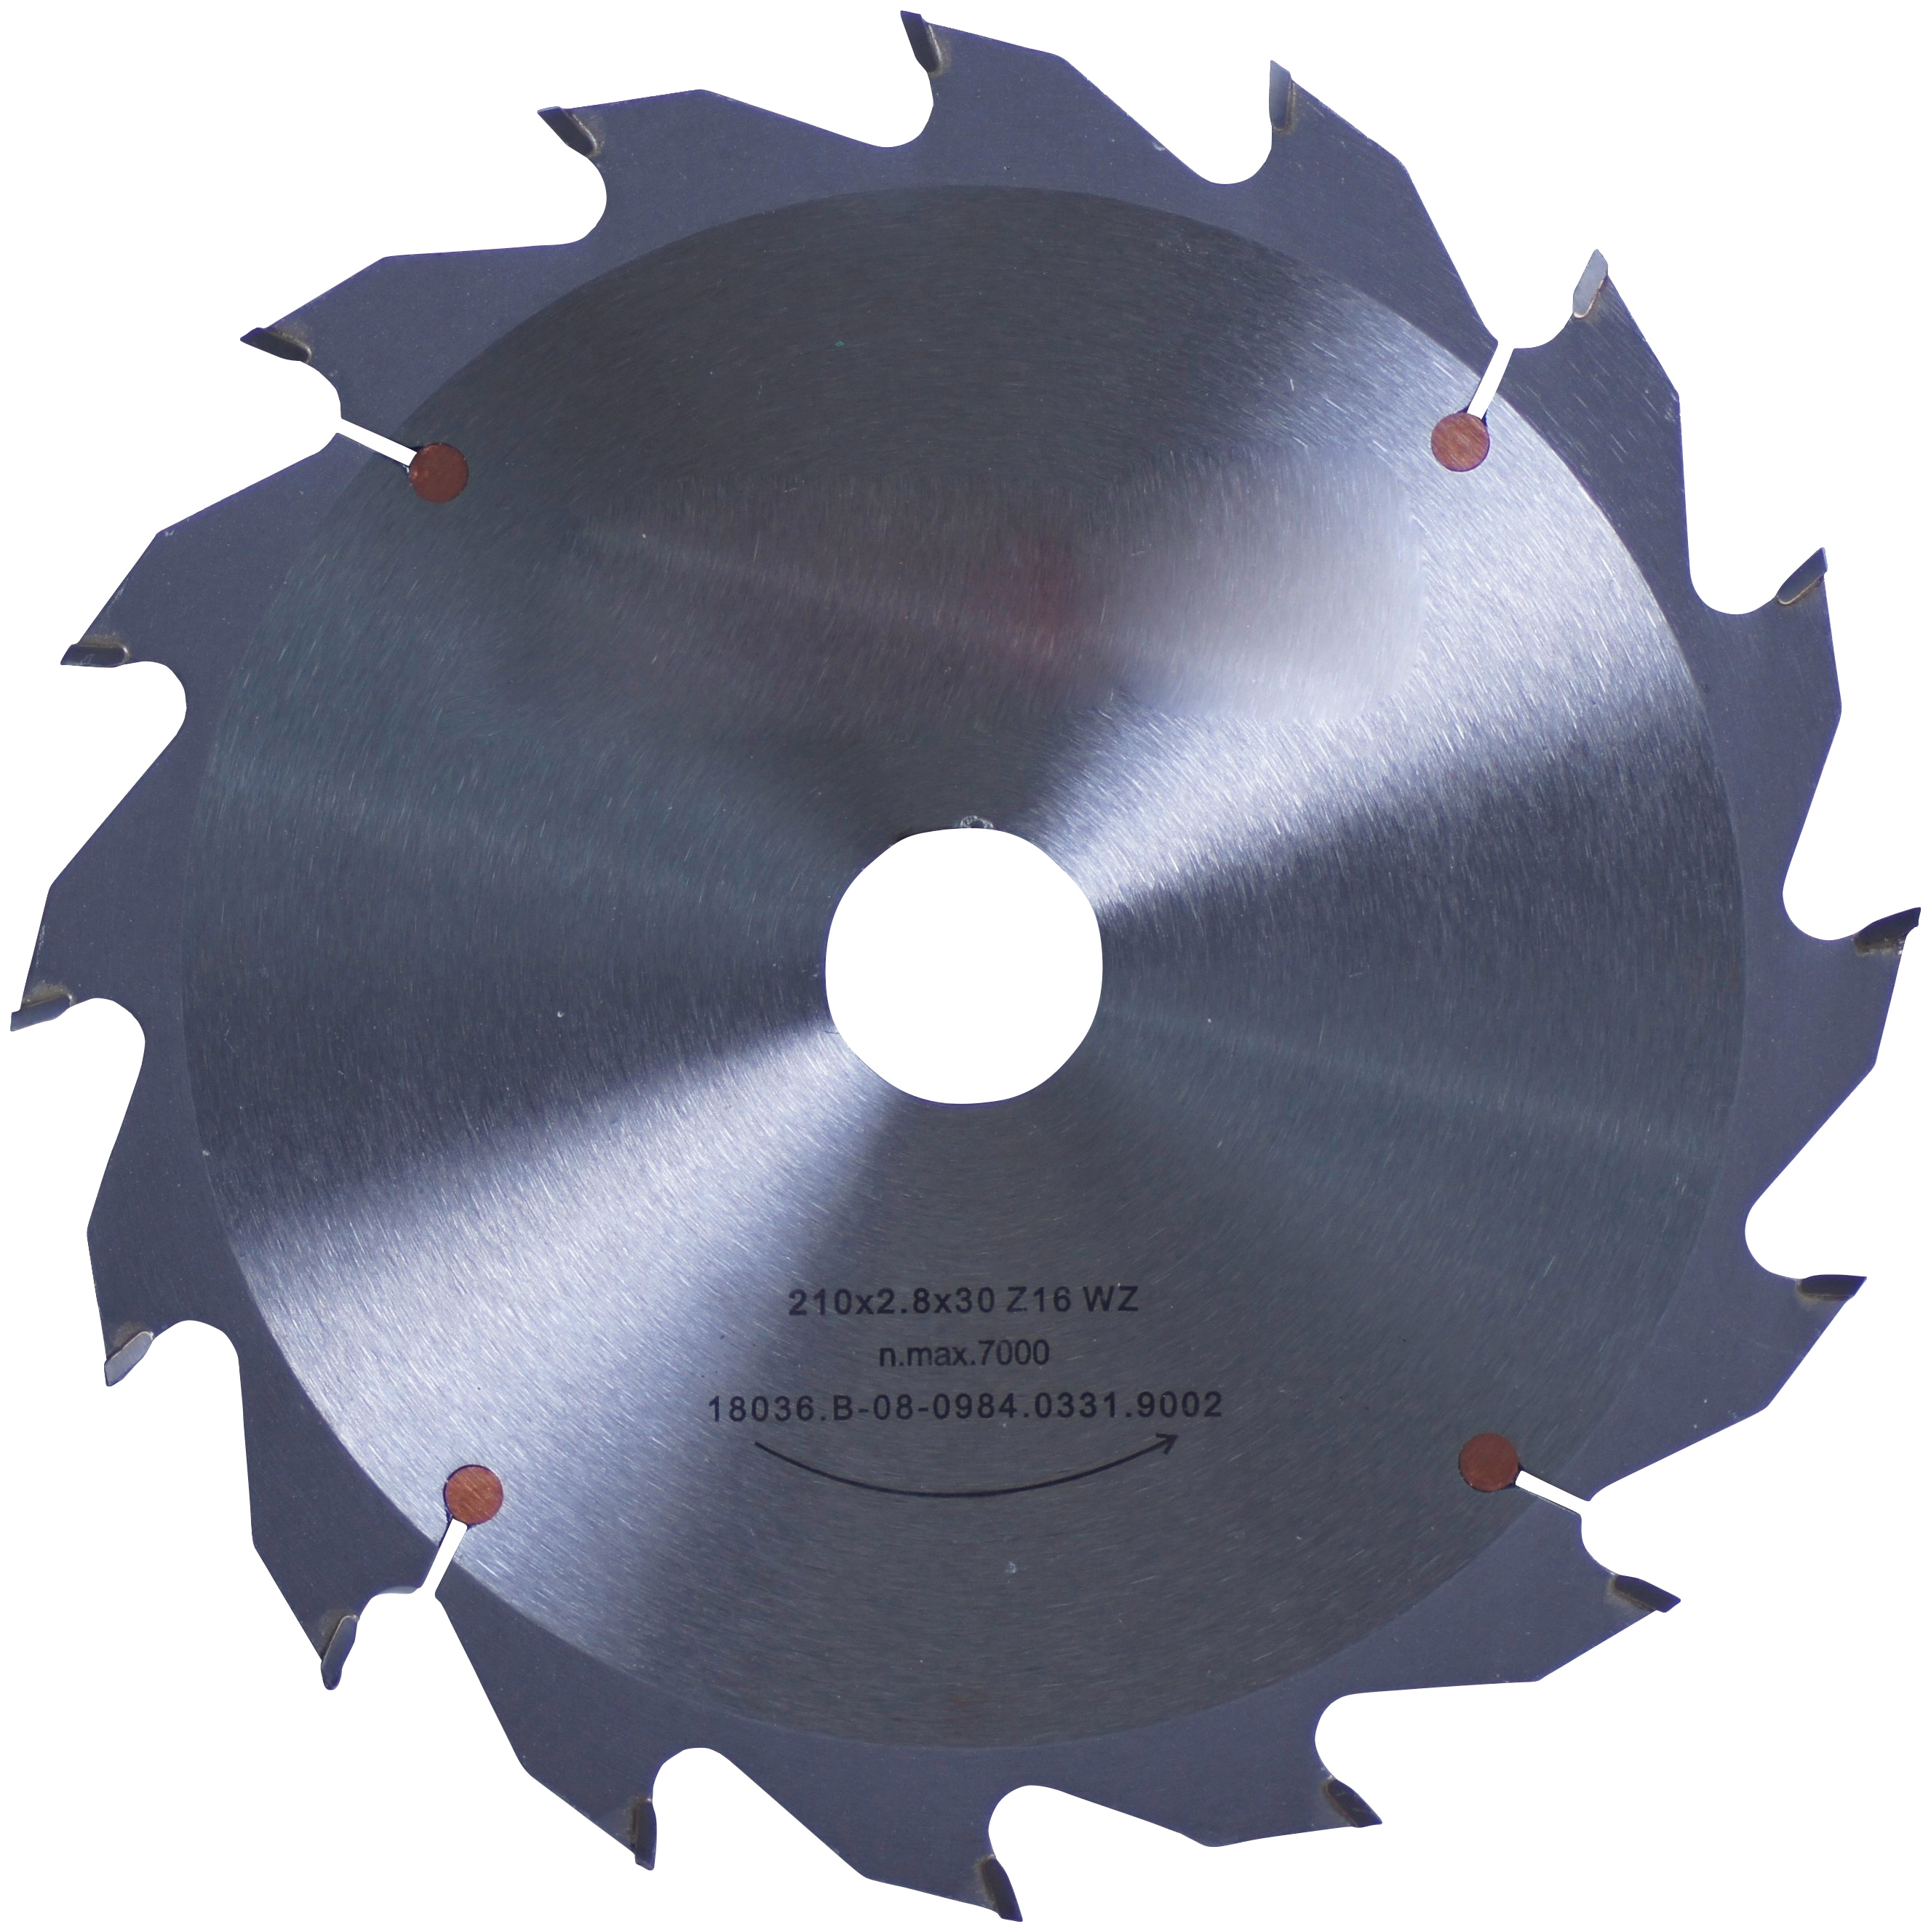 Connex Kreissägeblatt, Handkreissägeblatt, HM, grob, Ø 210 mm grau Sägen Werkzeug Maschinen Kreissägeblatt